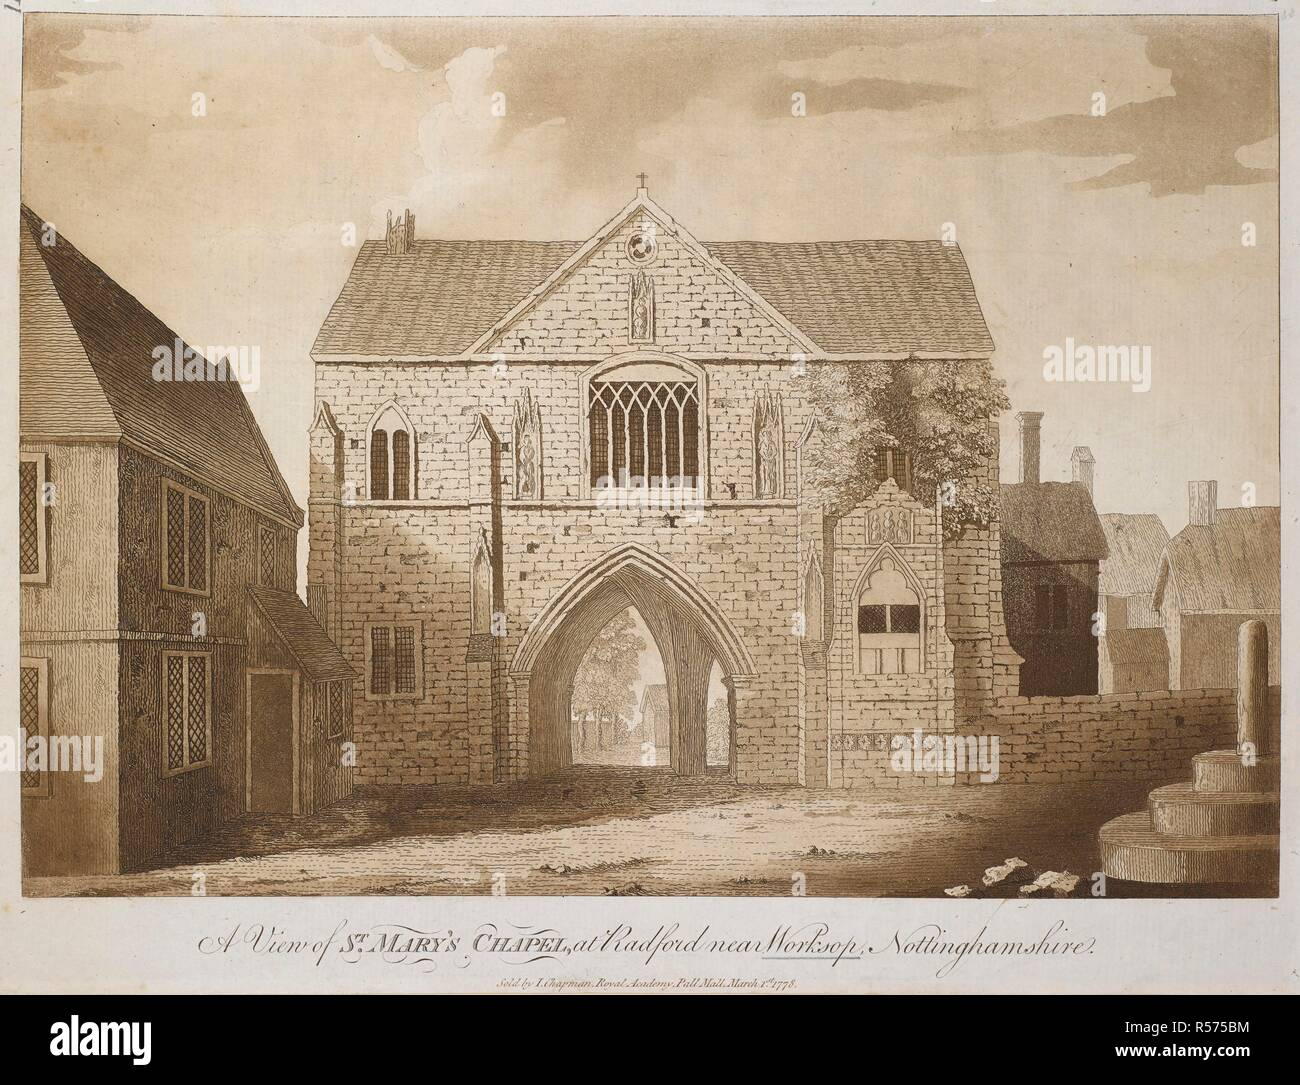 A view of St. Mary's Church at Radford near Worksop, Nottinghamshire. View of St. Mary's Church at Radford near Worksop. 1778. Source: Maps K.Top.33.36.c. Language: English. Stock Photo